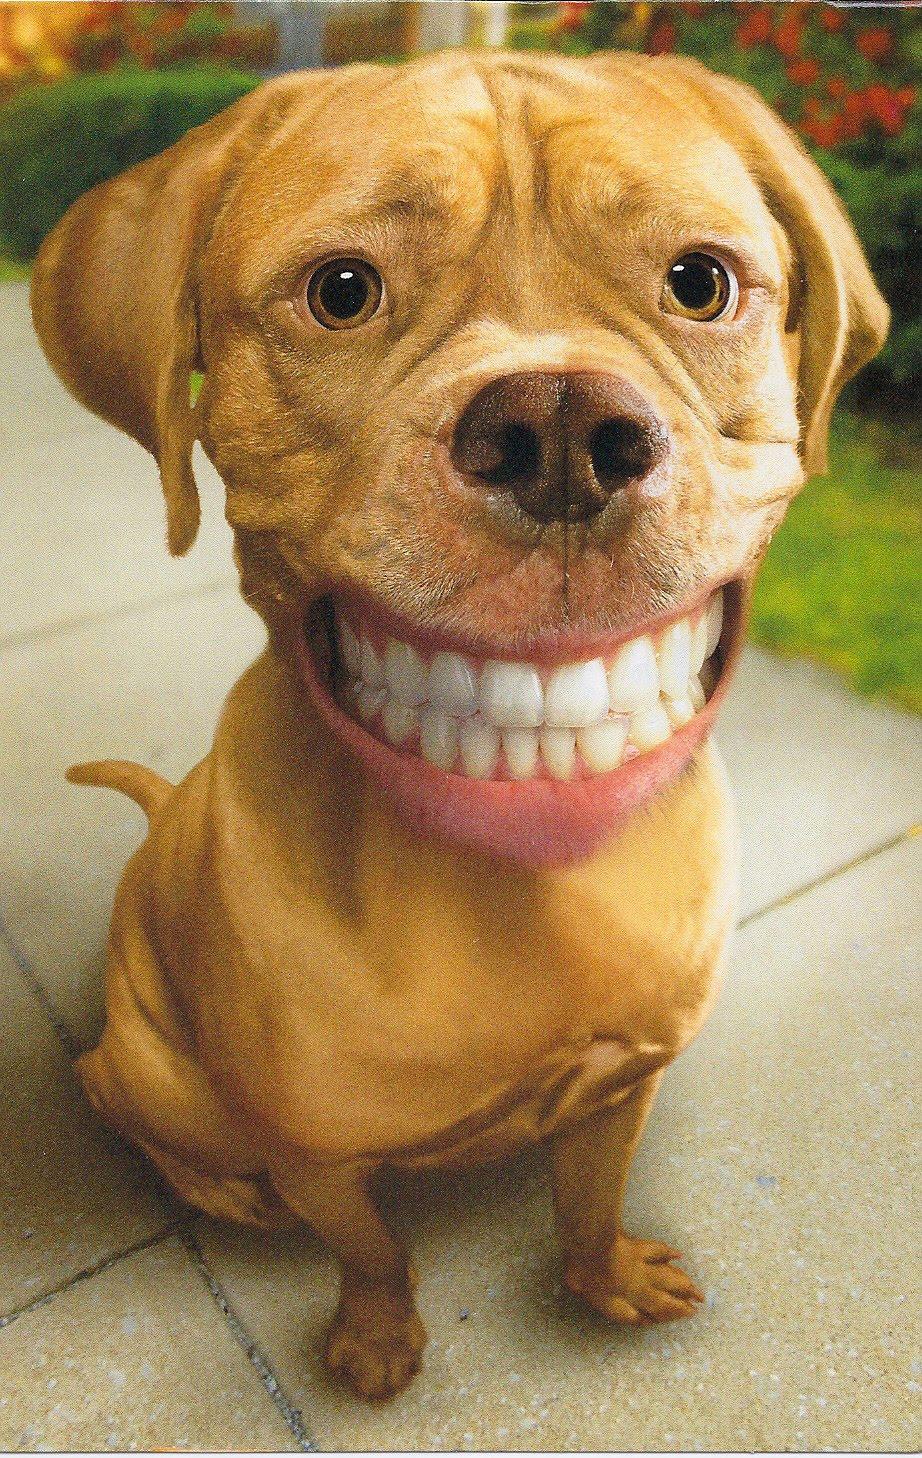 Smiling Animal Teeth